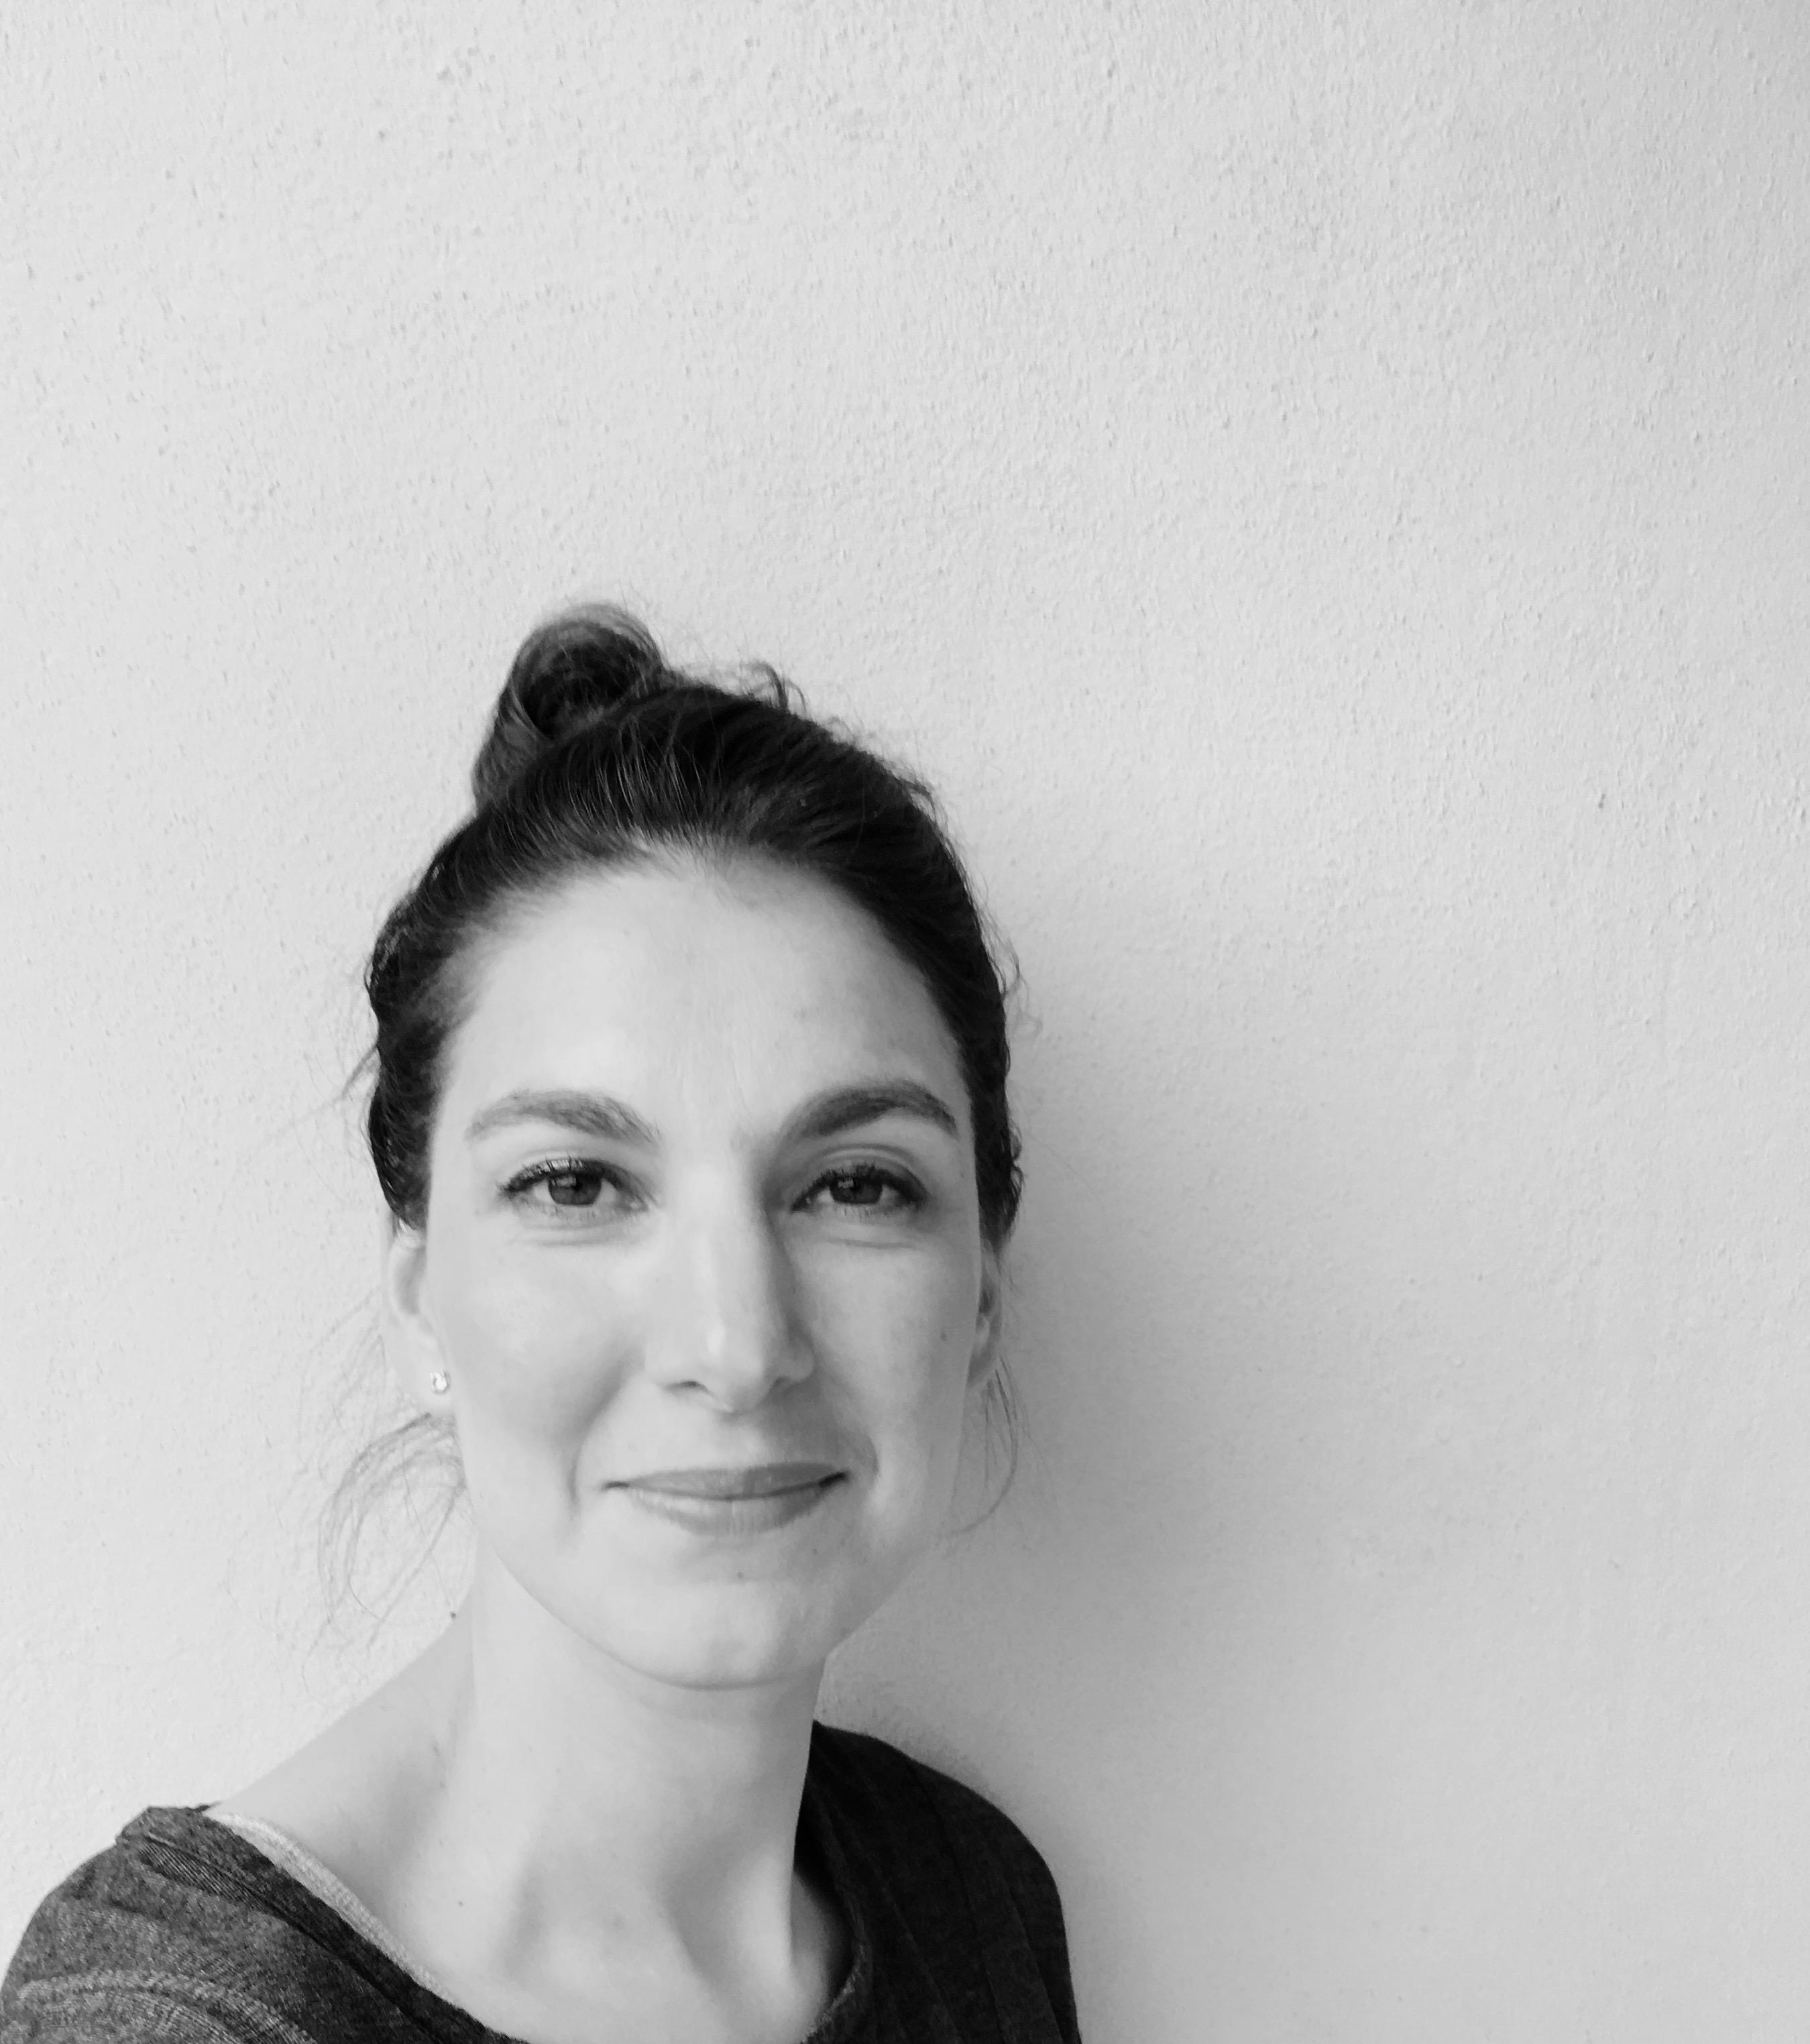 Gita-Marie Goldman